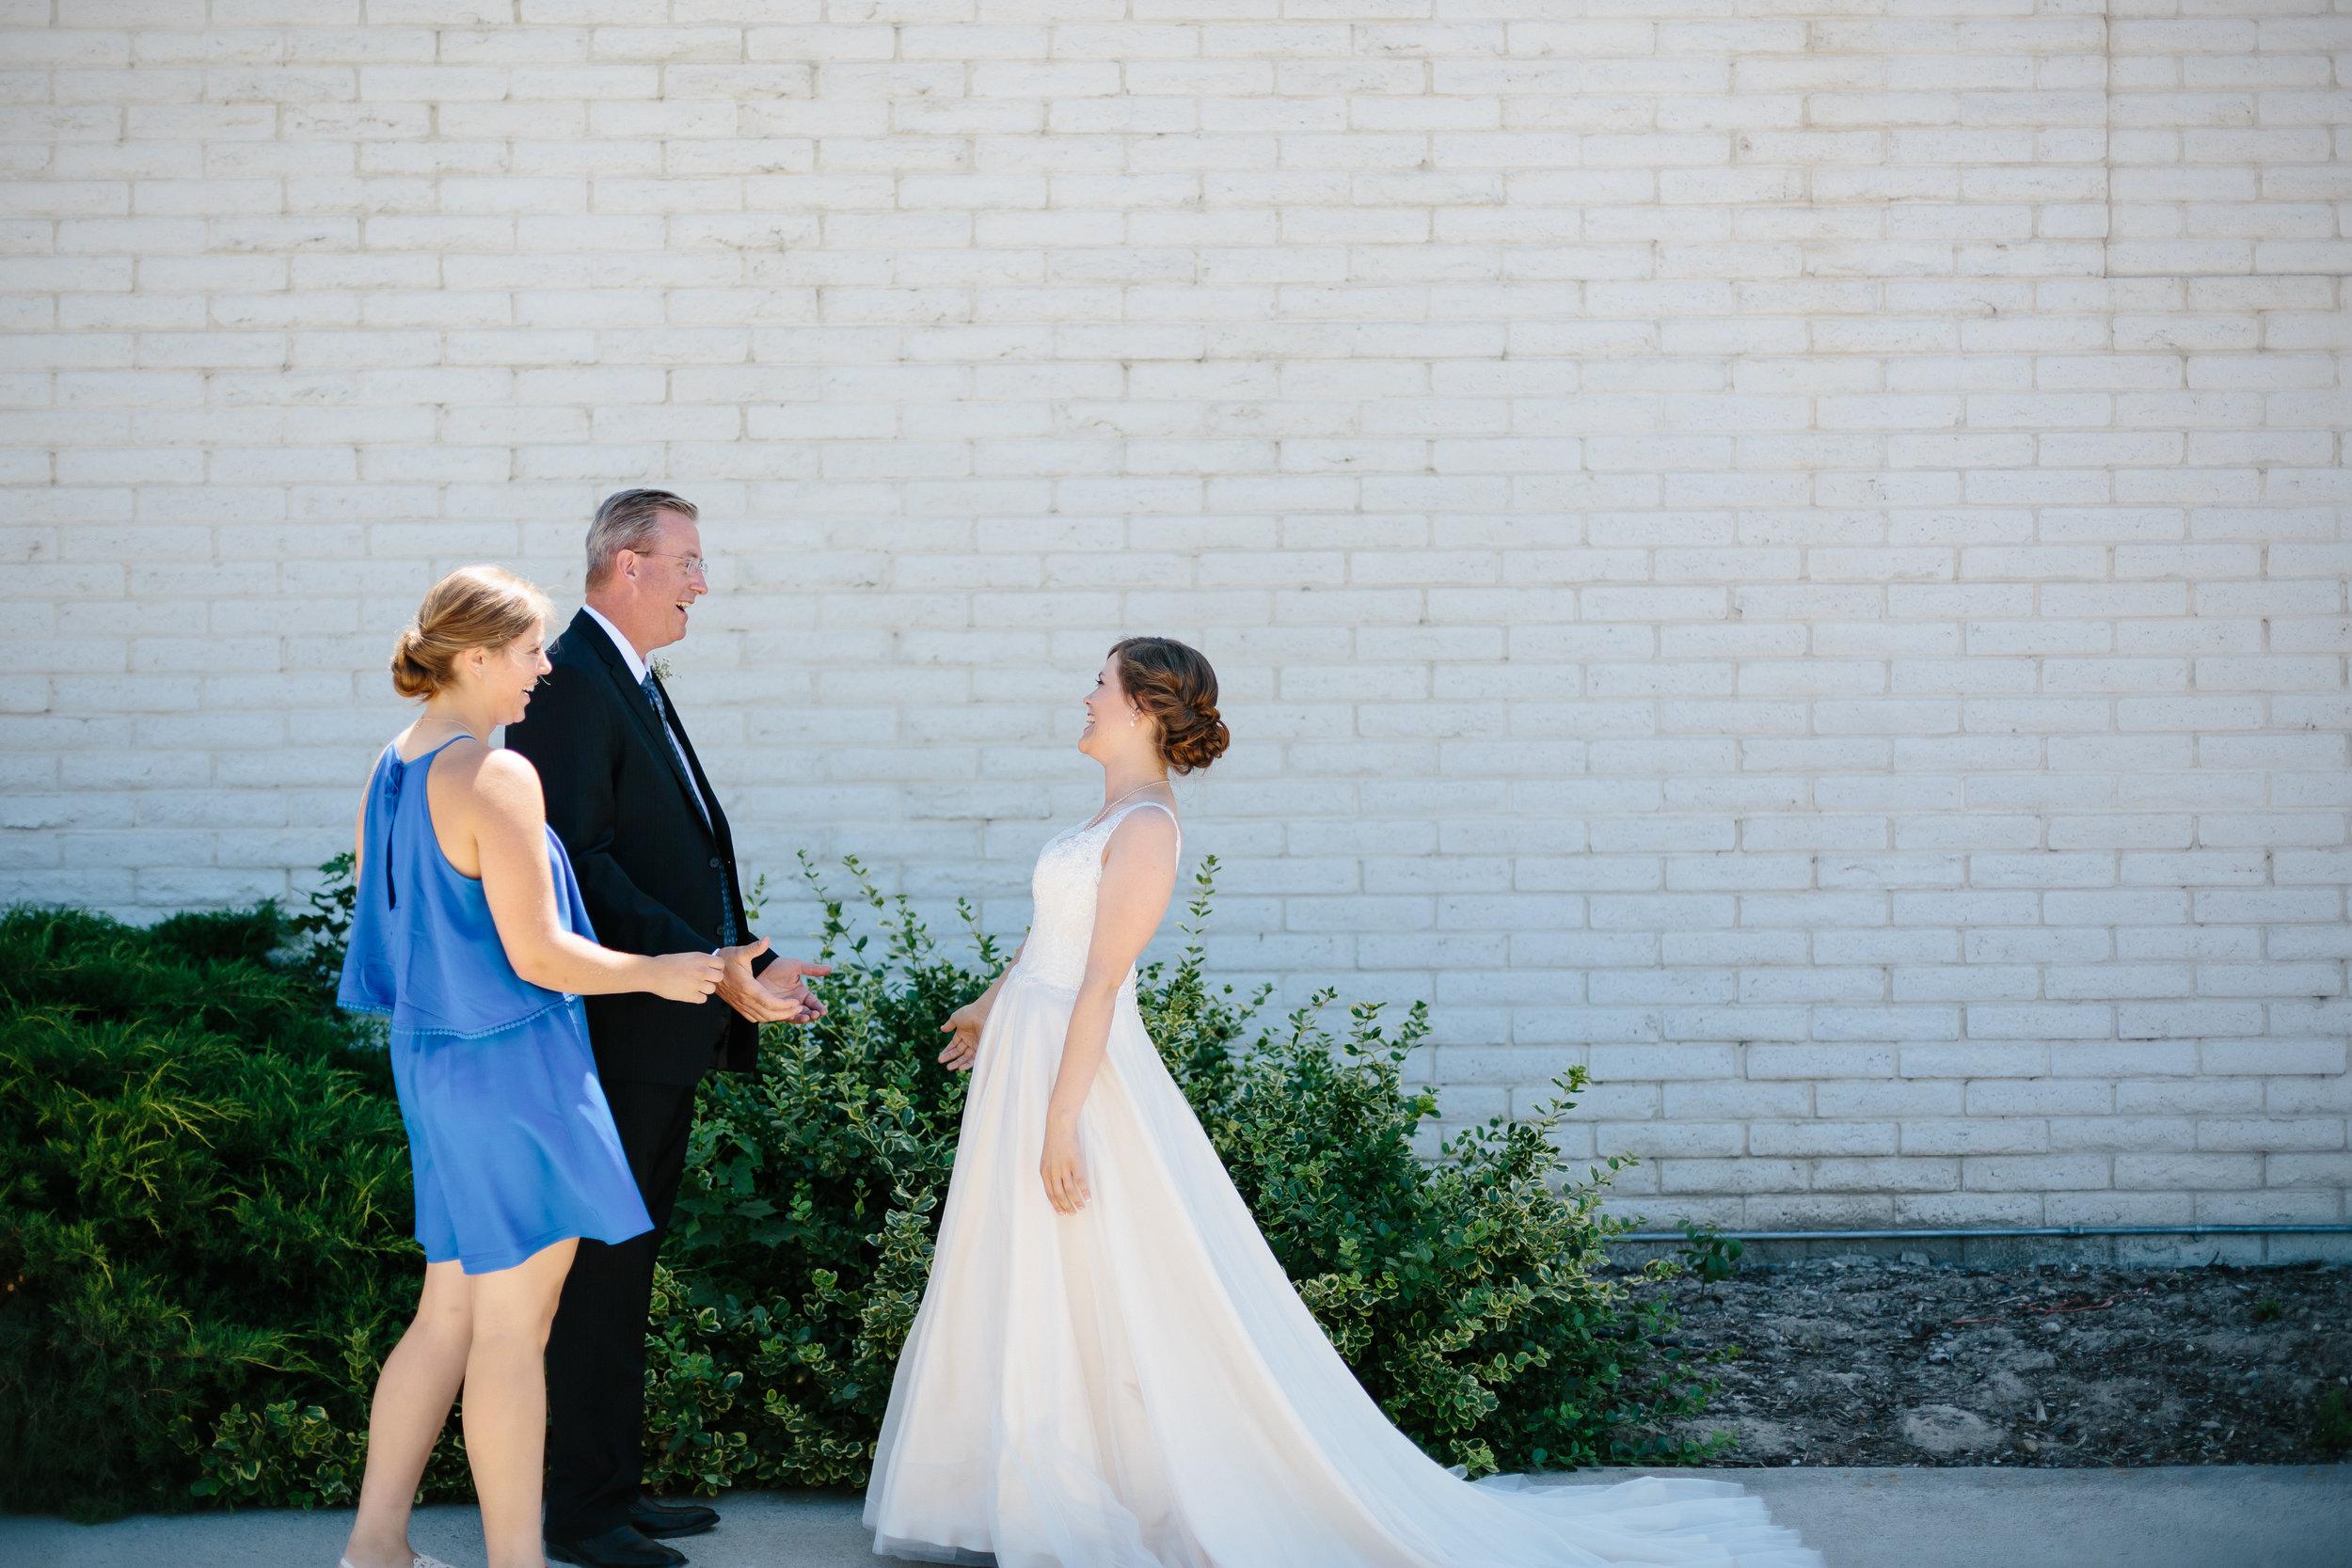 Jordan & Shantel Married - Idaho - Corrie Mick Photography-156.jpg